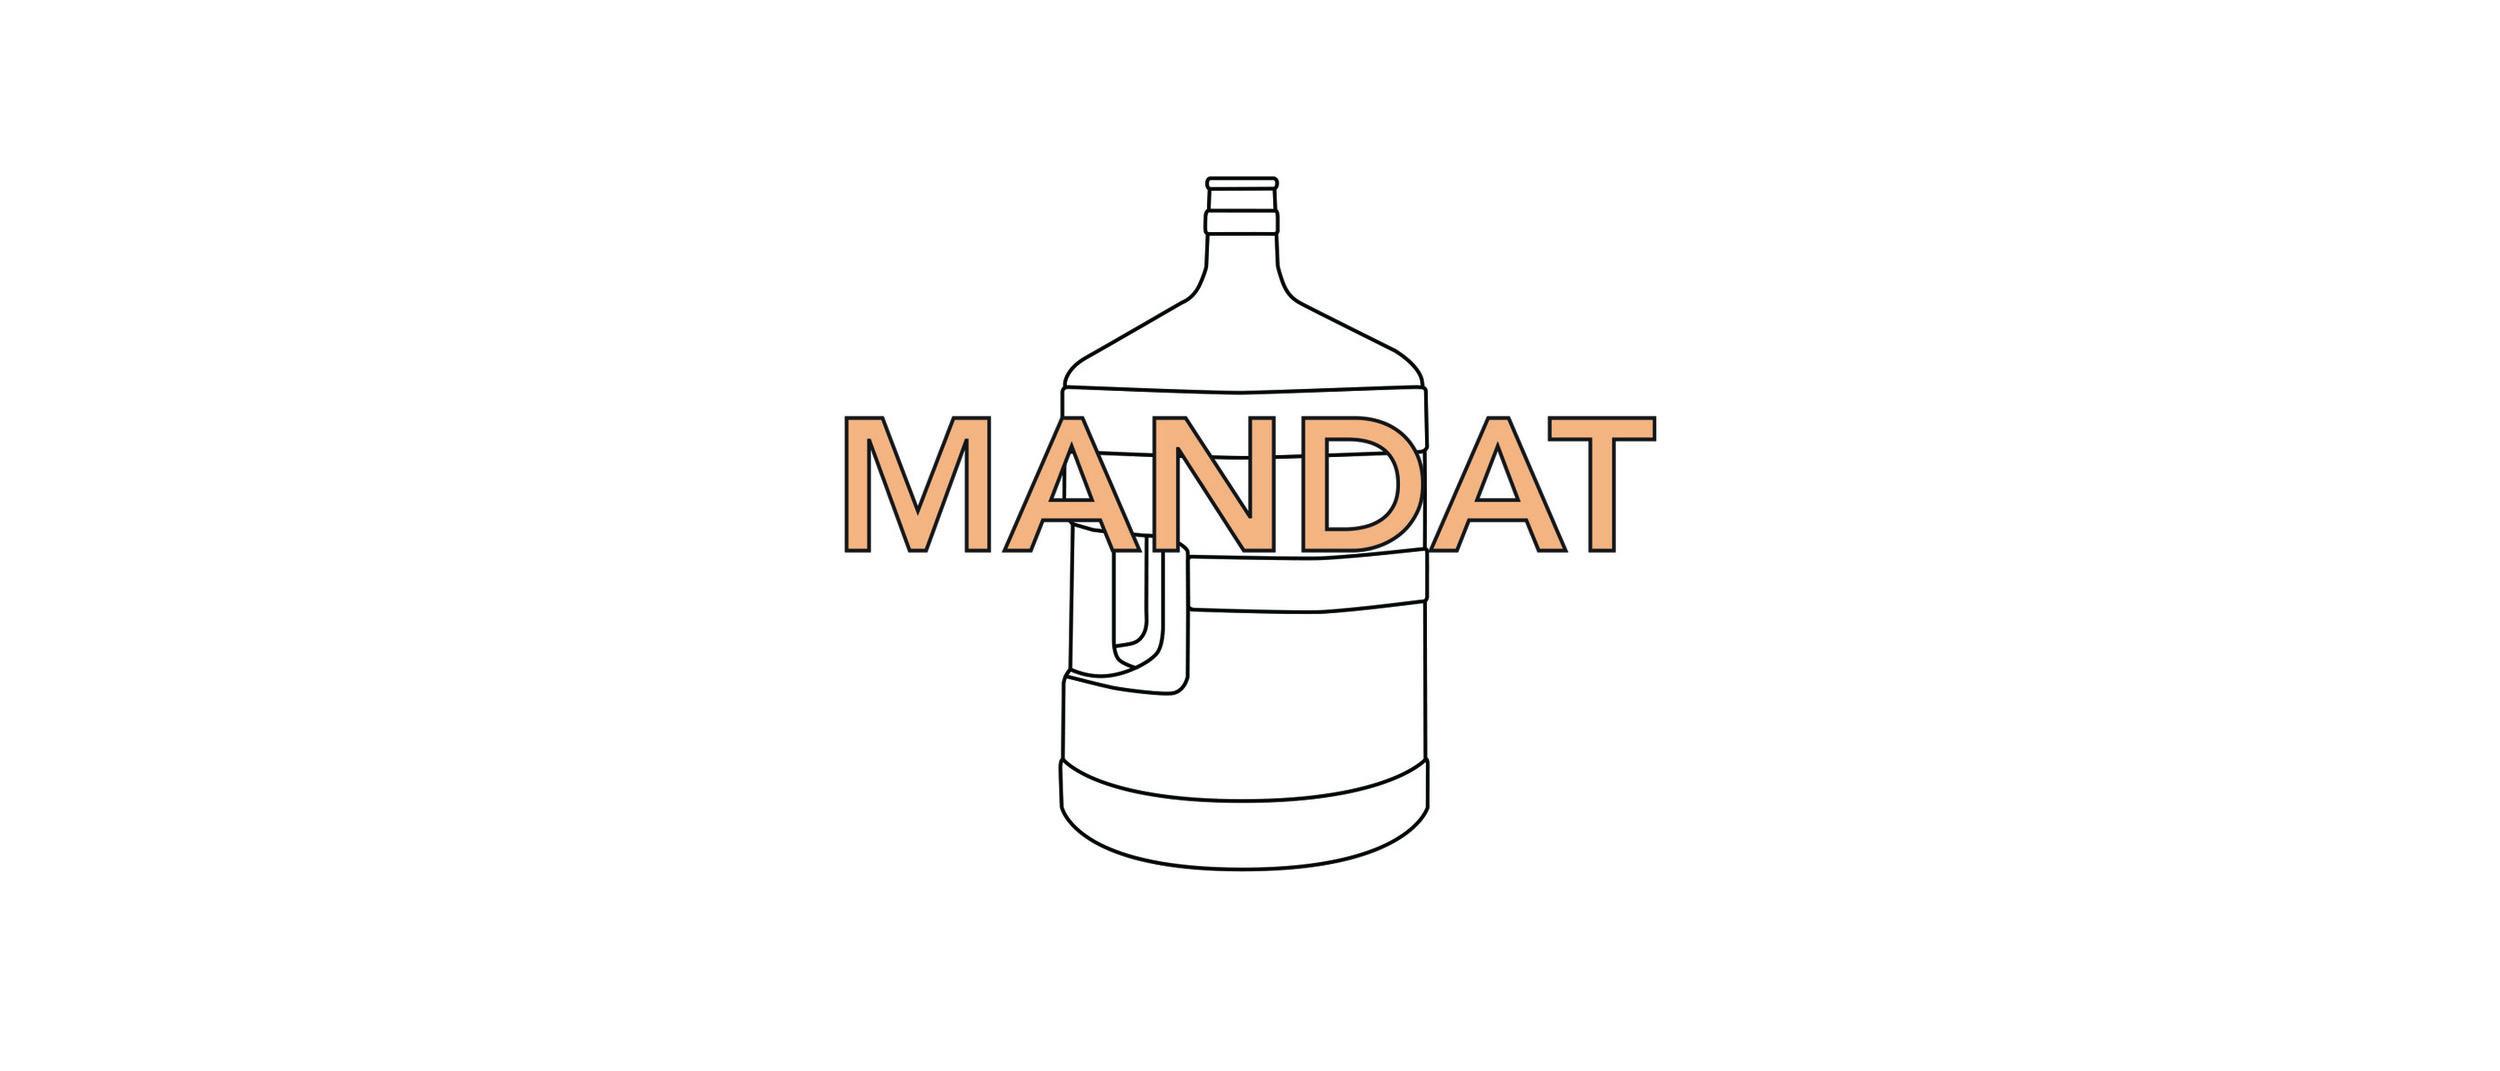 mandat.jpg